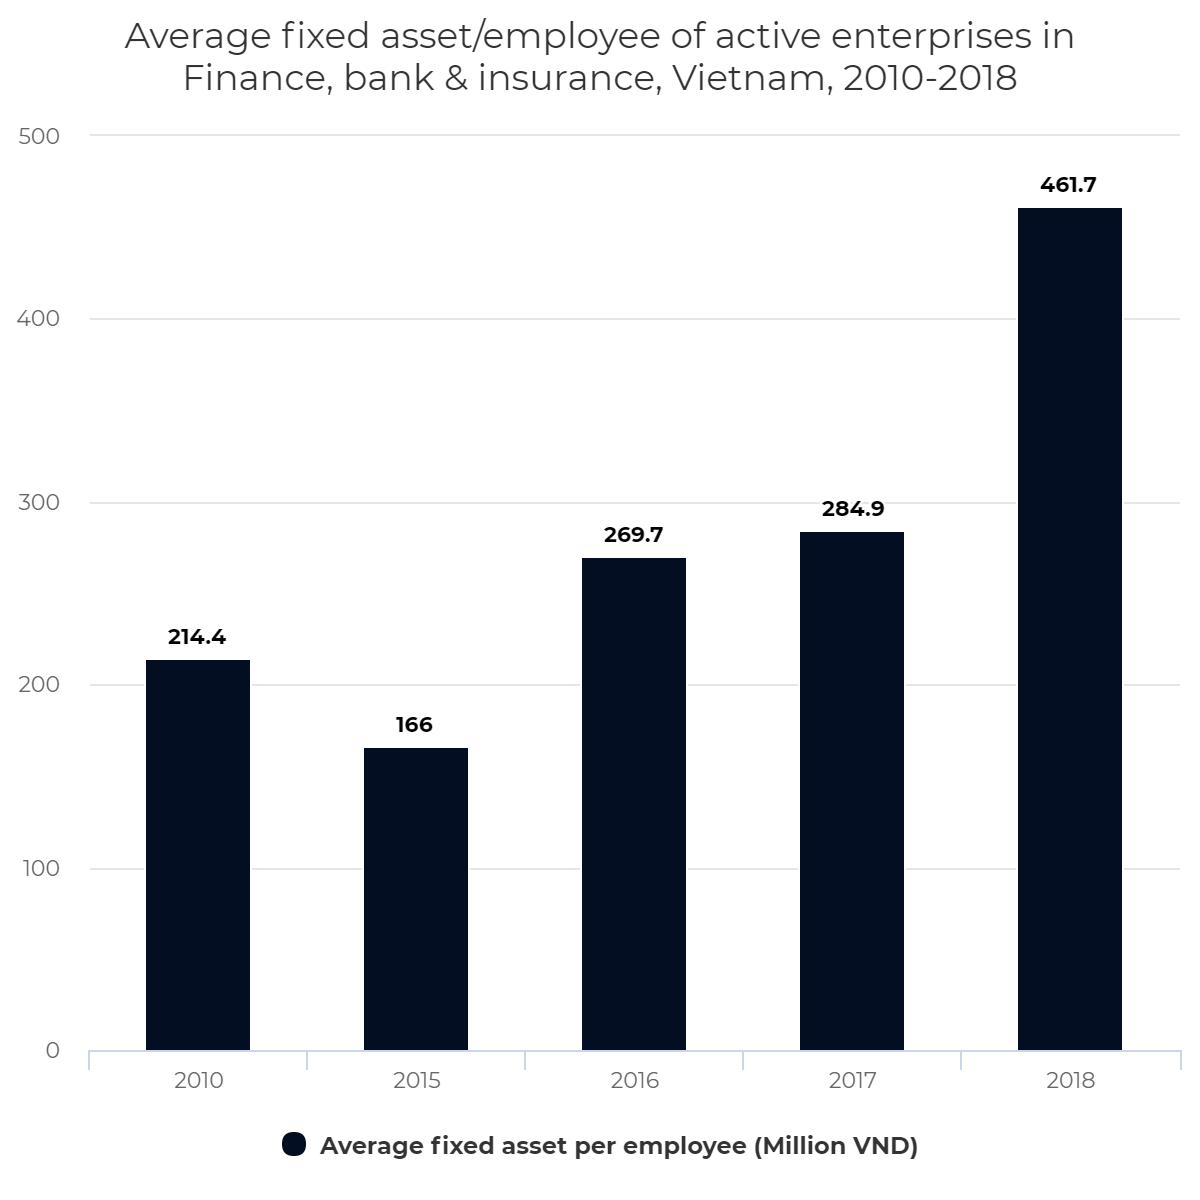 Average fixed asset/employee of active enterprises in Finance, bank & insurance, Vietnam, 2010-2018